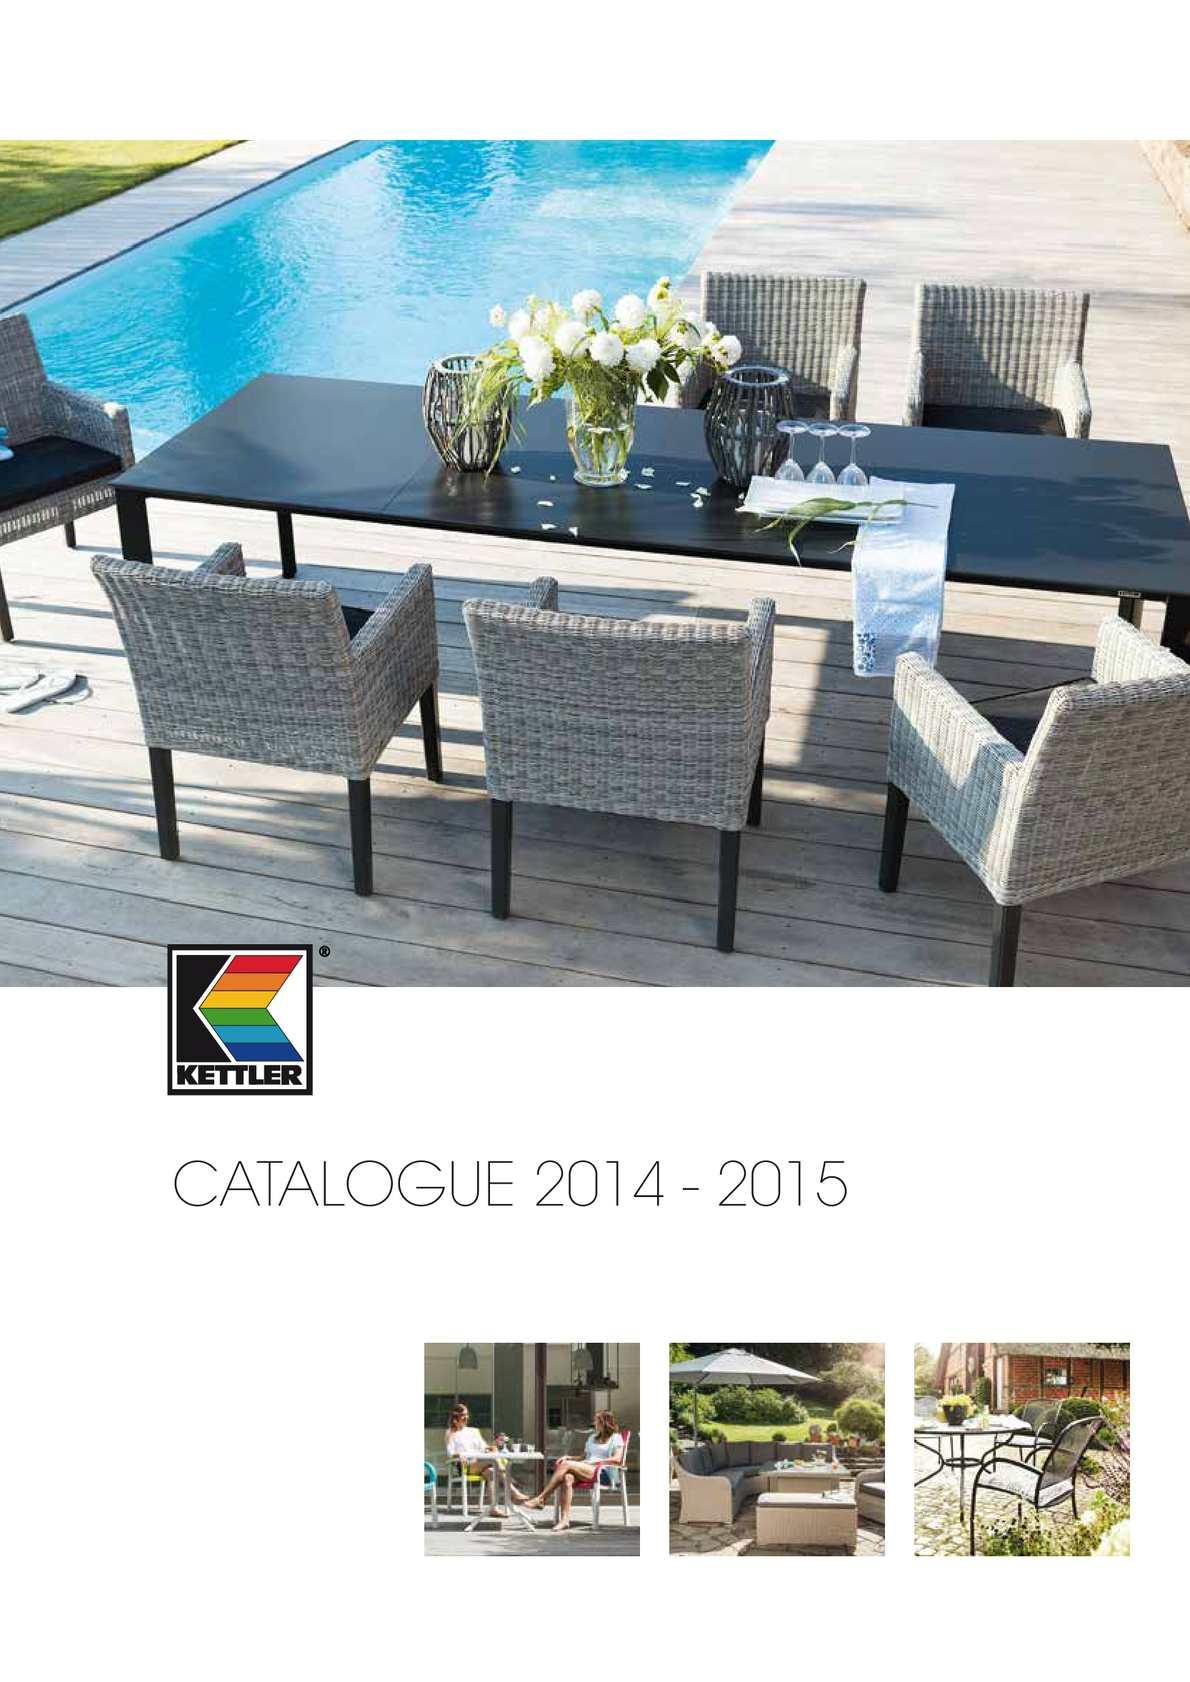 Calaméo - Catalogue Kettler 2014-2015 dedans Kettler Mobilier De Jardin